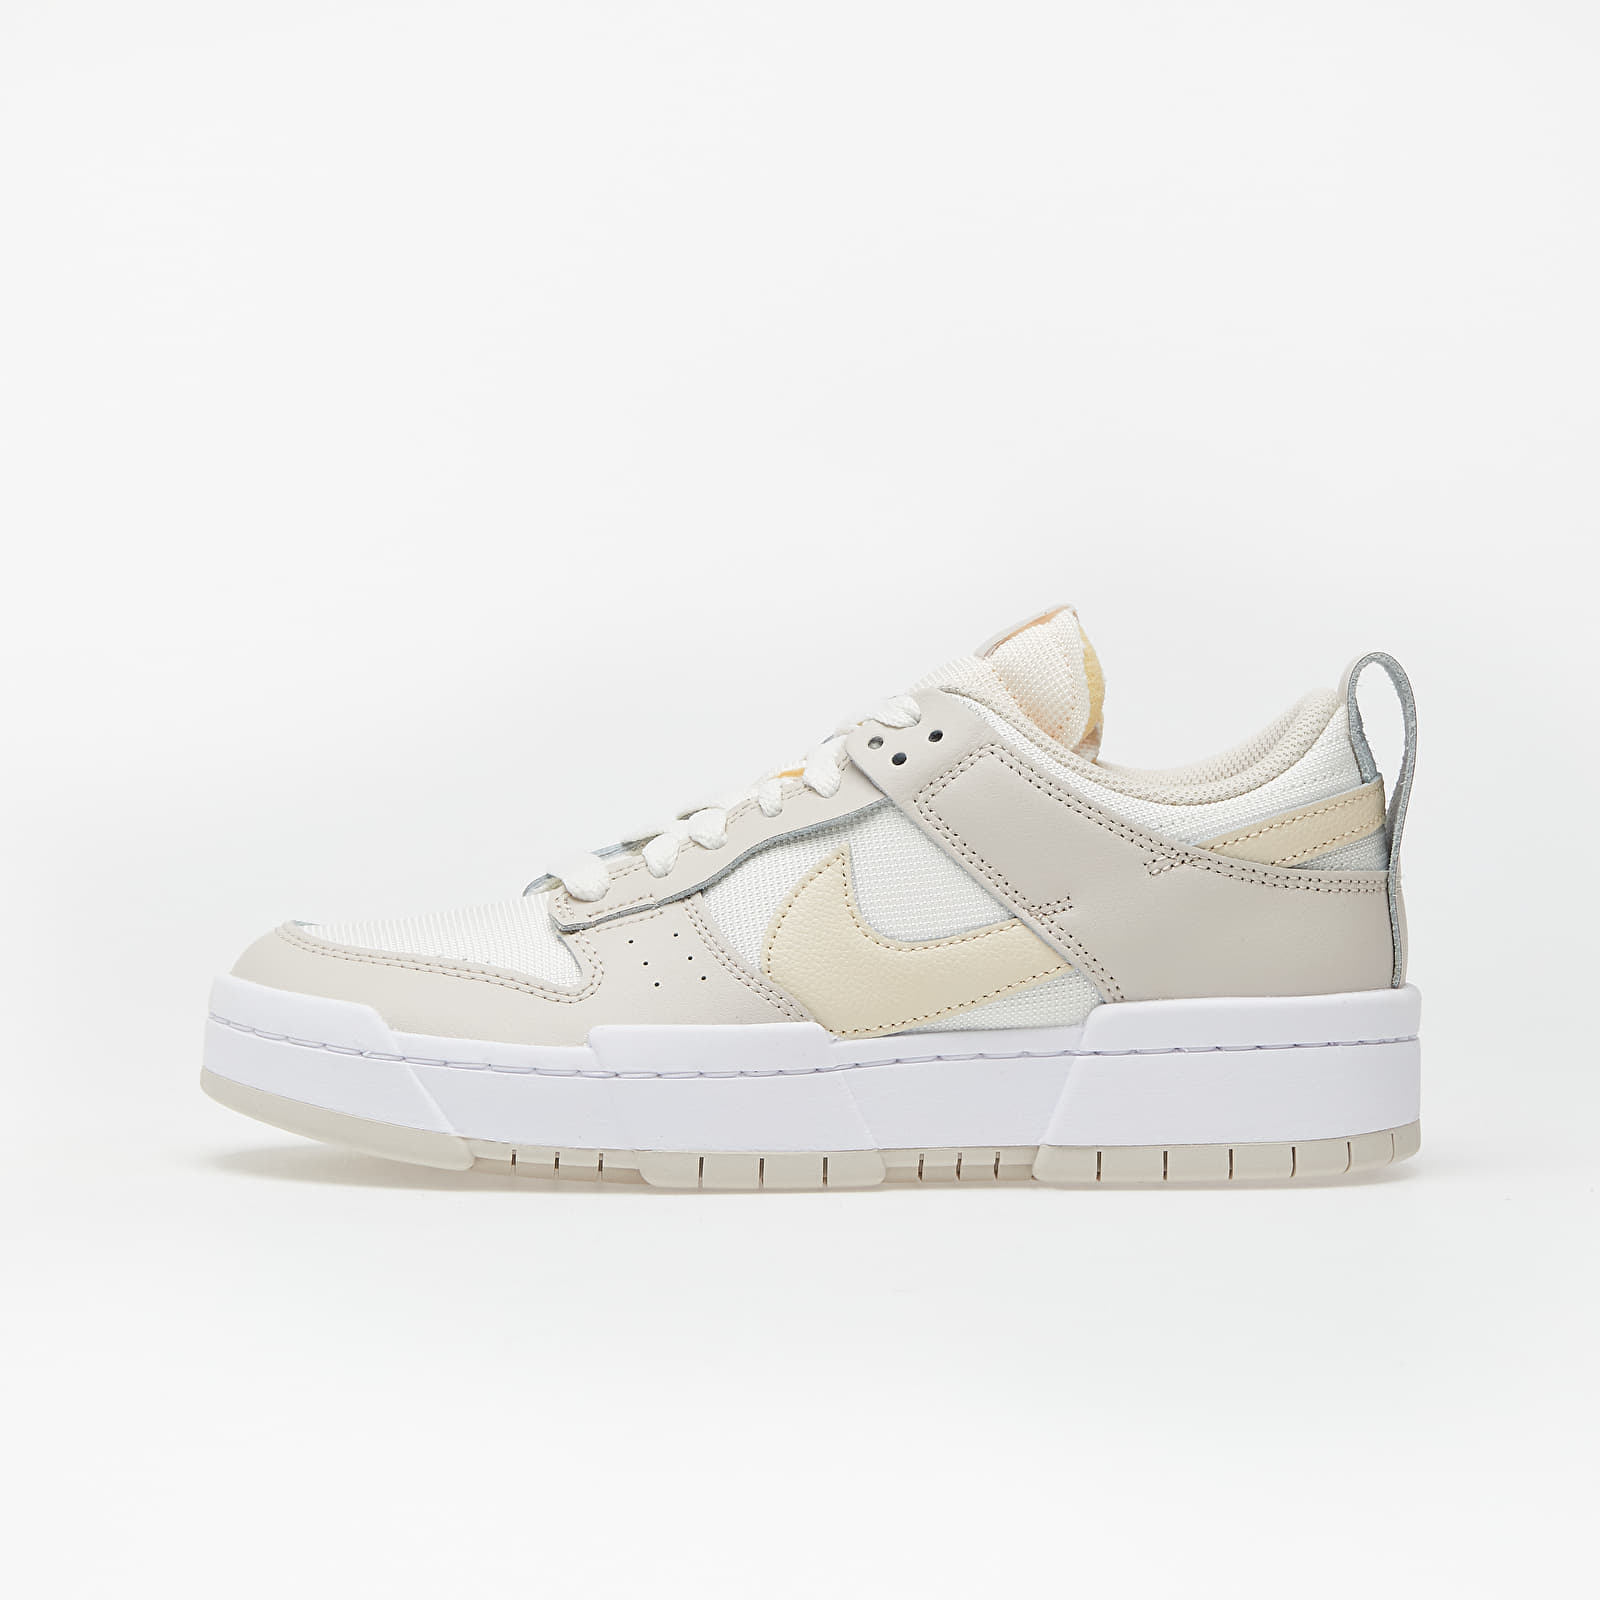 Women's shoes Nike W Dunk Low Disrupt Sail/ Pearl White-Desert Sand